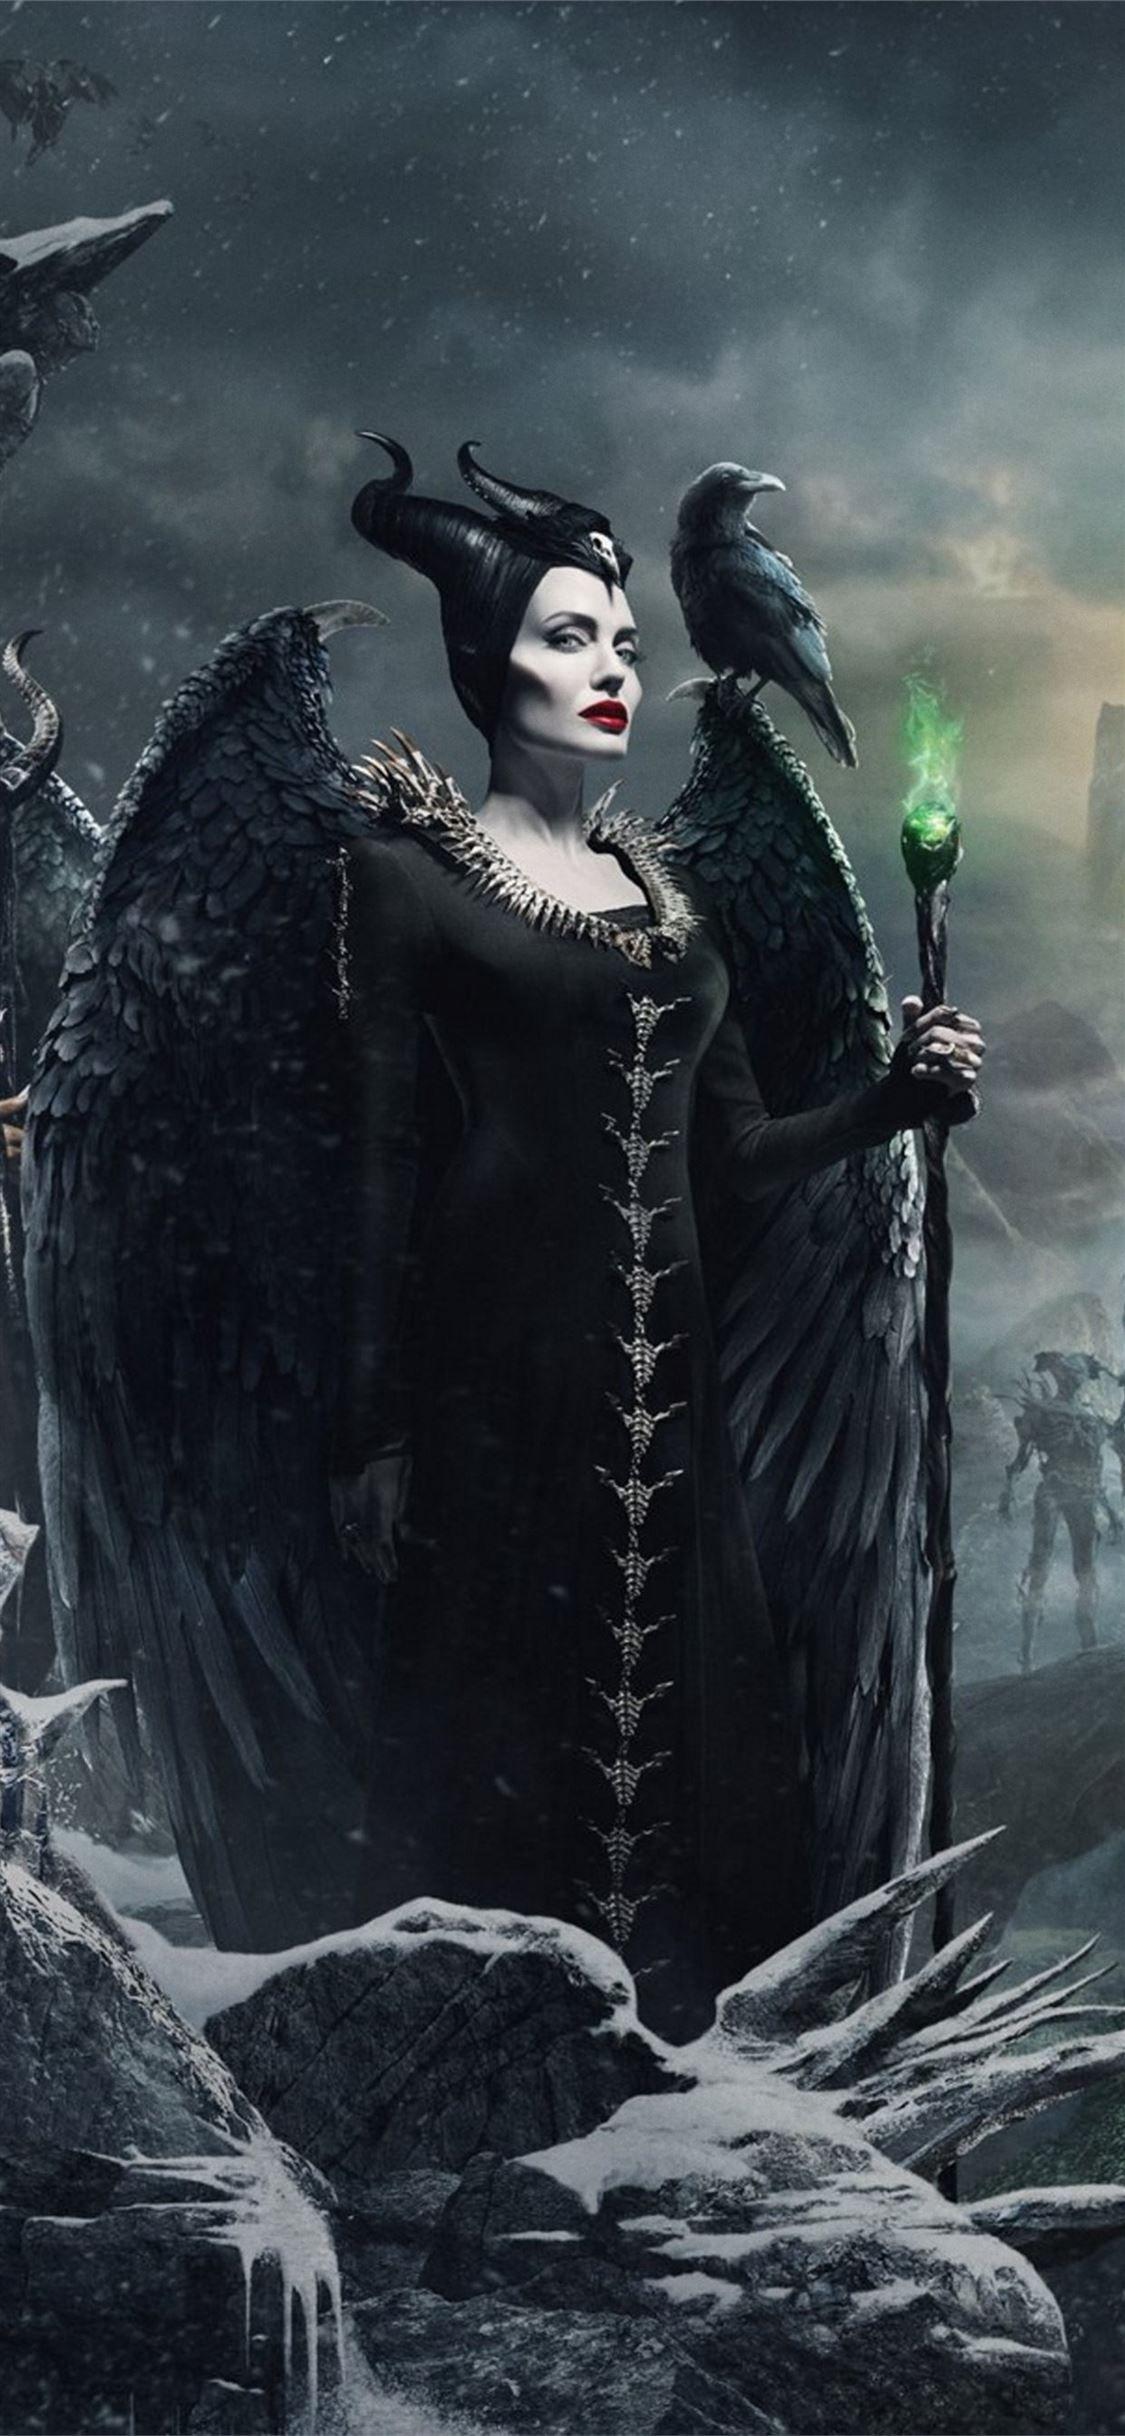 Maleficent Mistress Of Evil 4k New Maleficent Maleficentmistressofevil 2019movies Movies 4k Ip Disney Phone Wallpaper Maleficent Iphone Background Disney